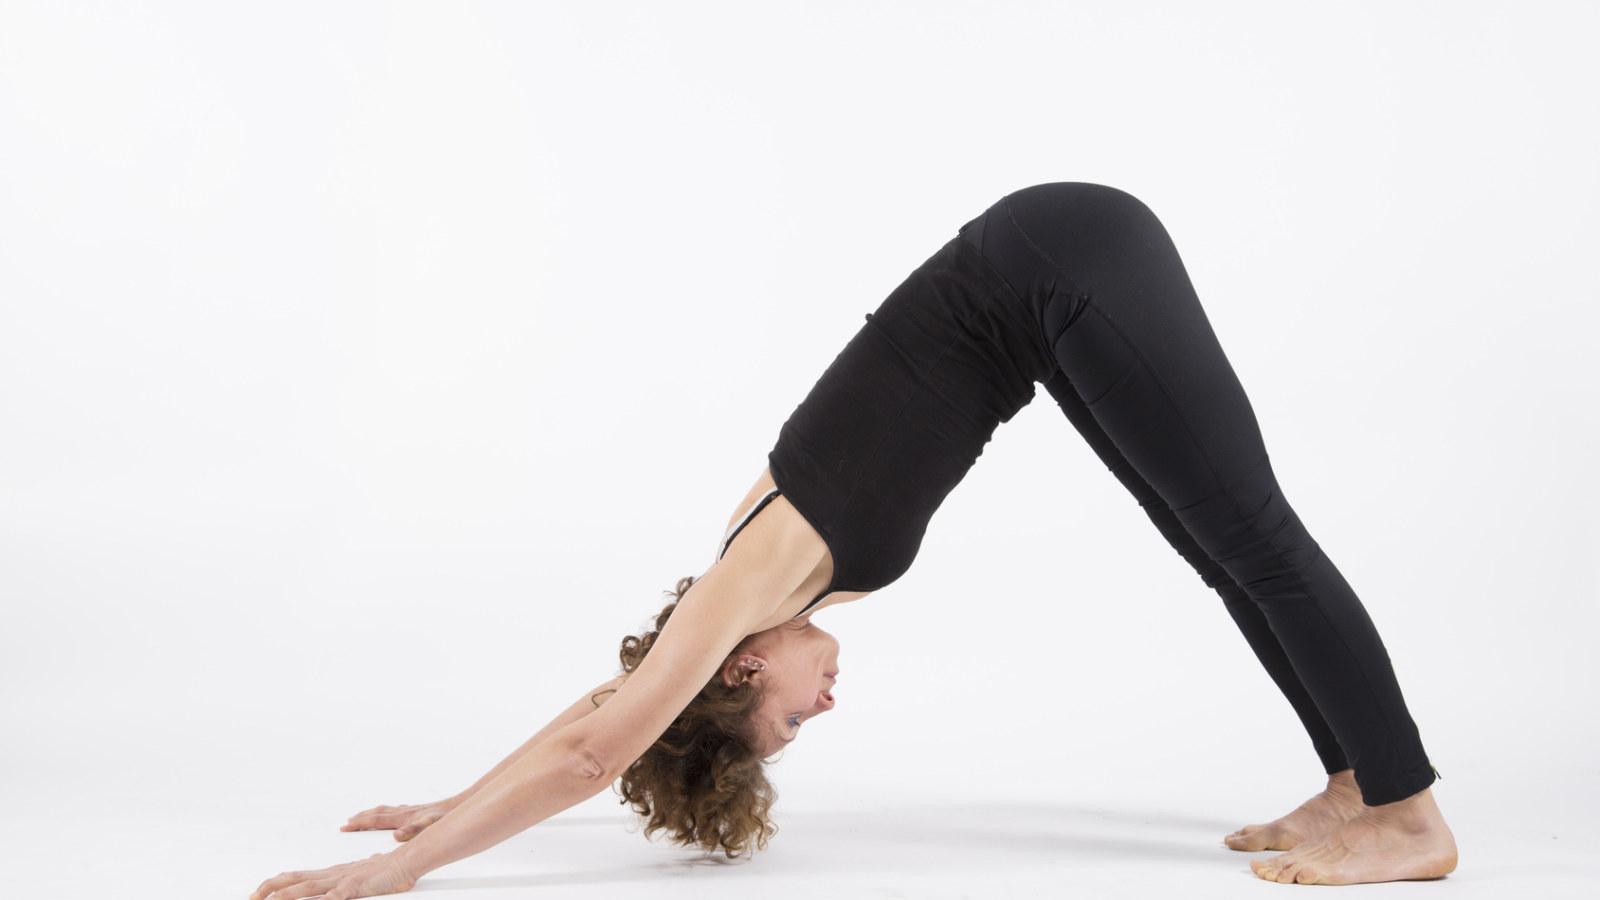 yoga while travelling downward facing dog pose